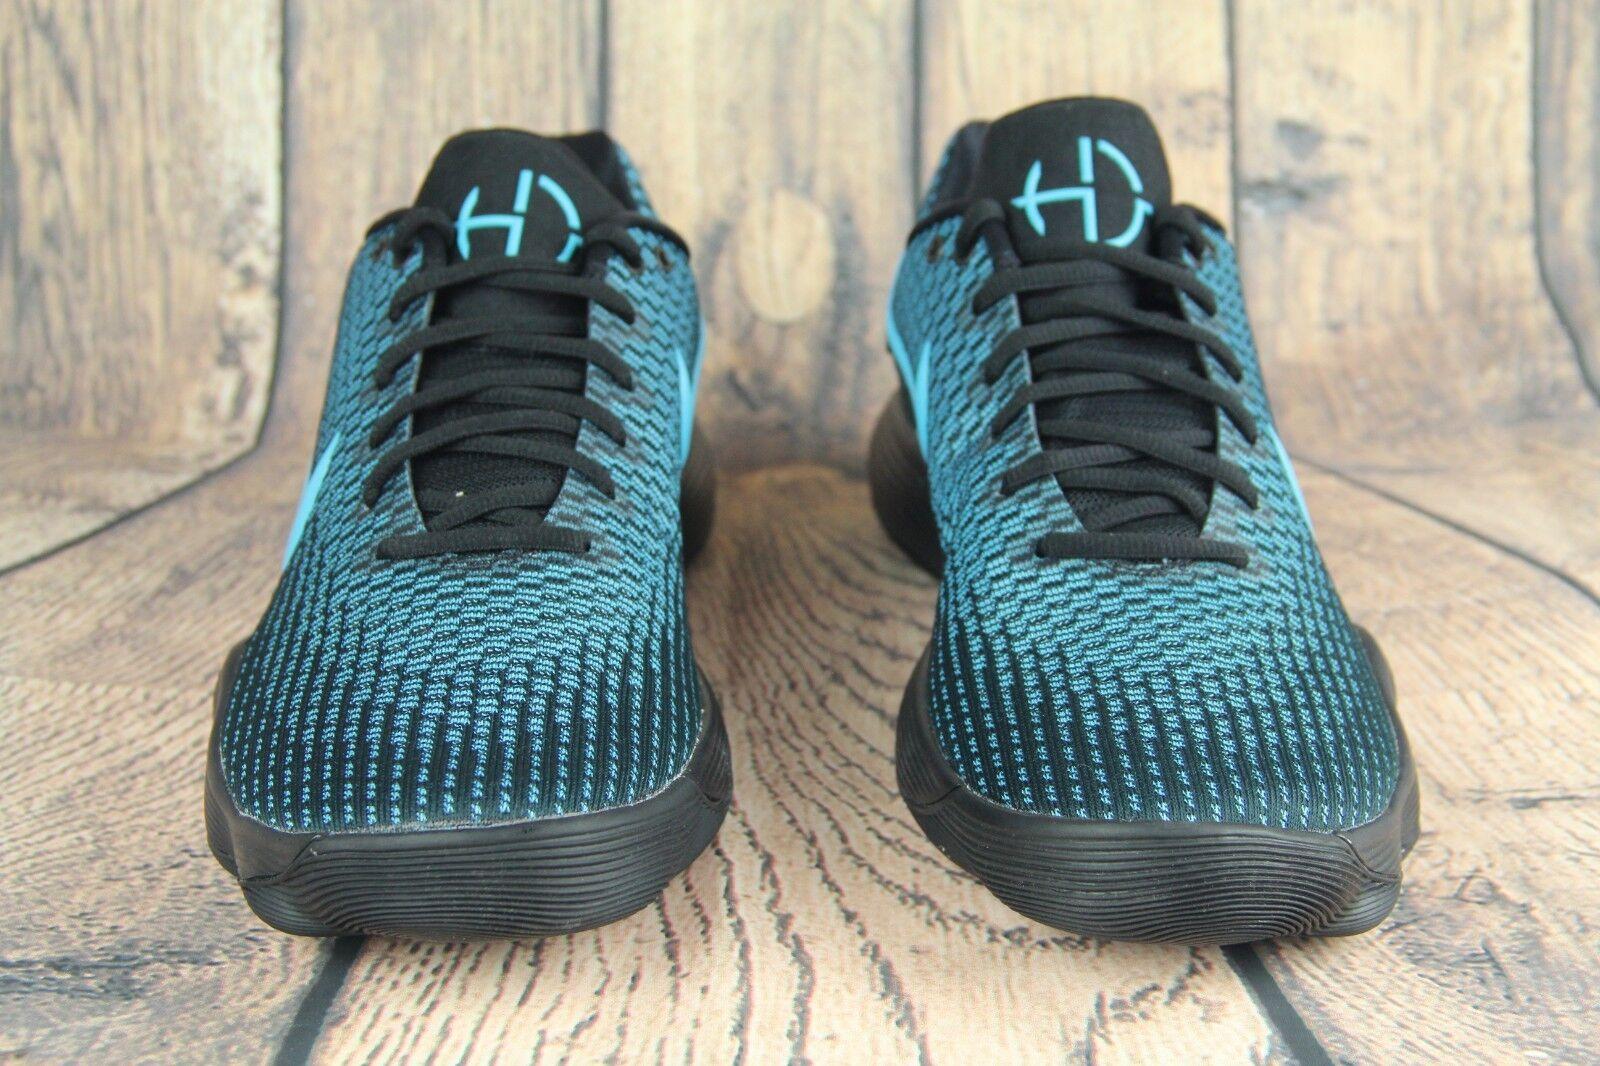 Mens Nike Hyperdunk 2017 Low Basketball shoes Black Chlorine bluee 897663-005 SZ